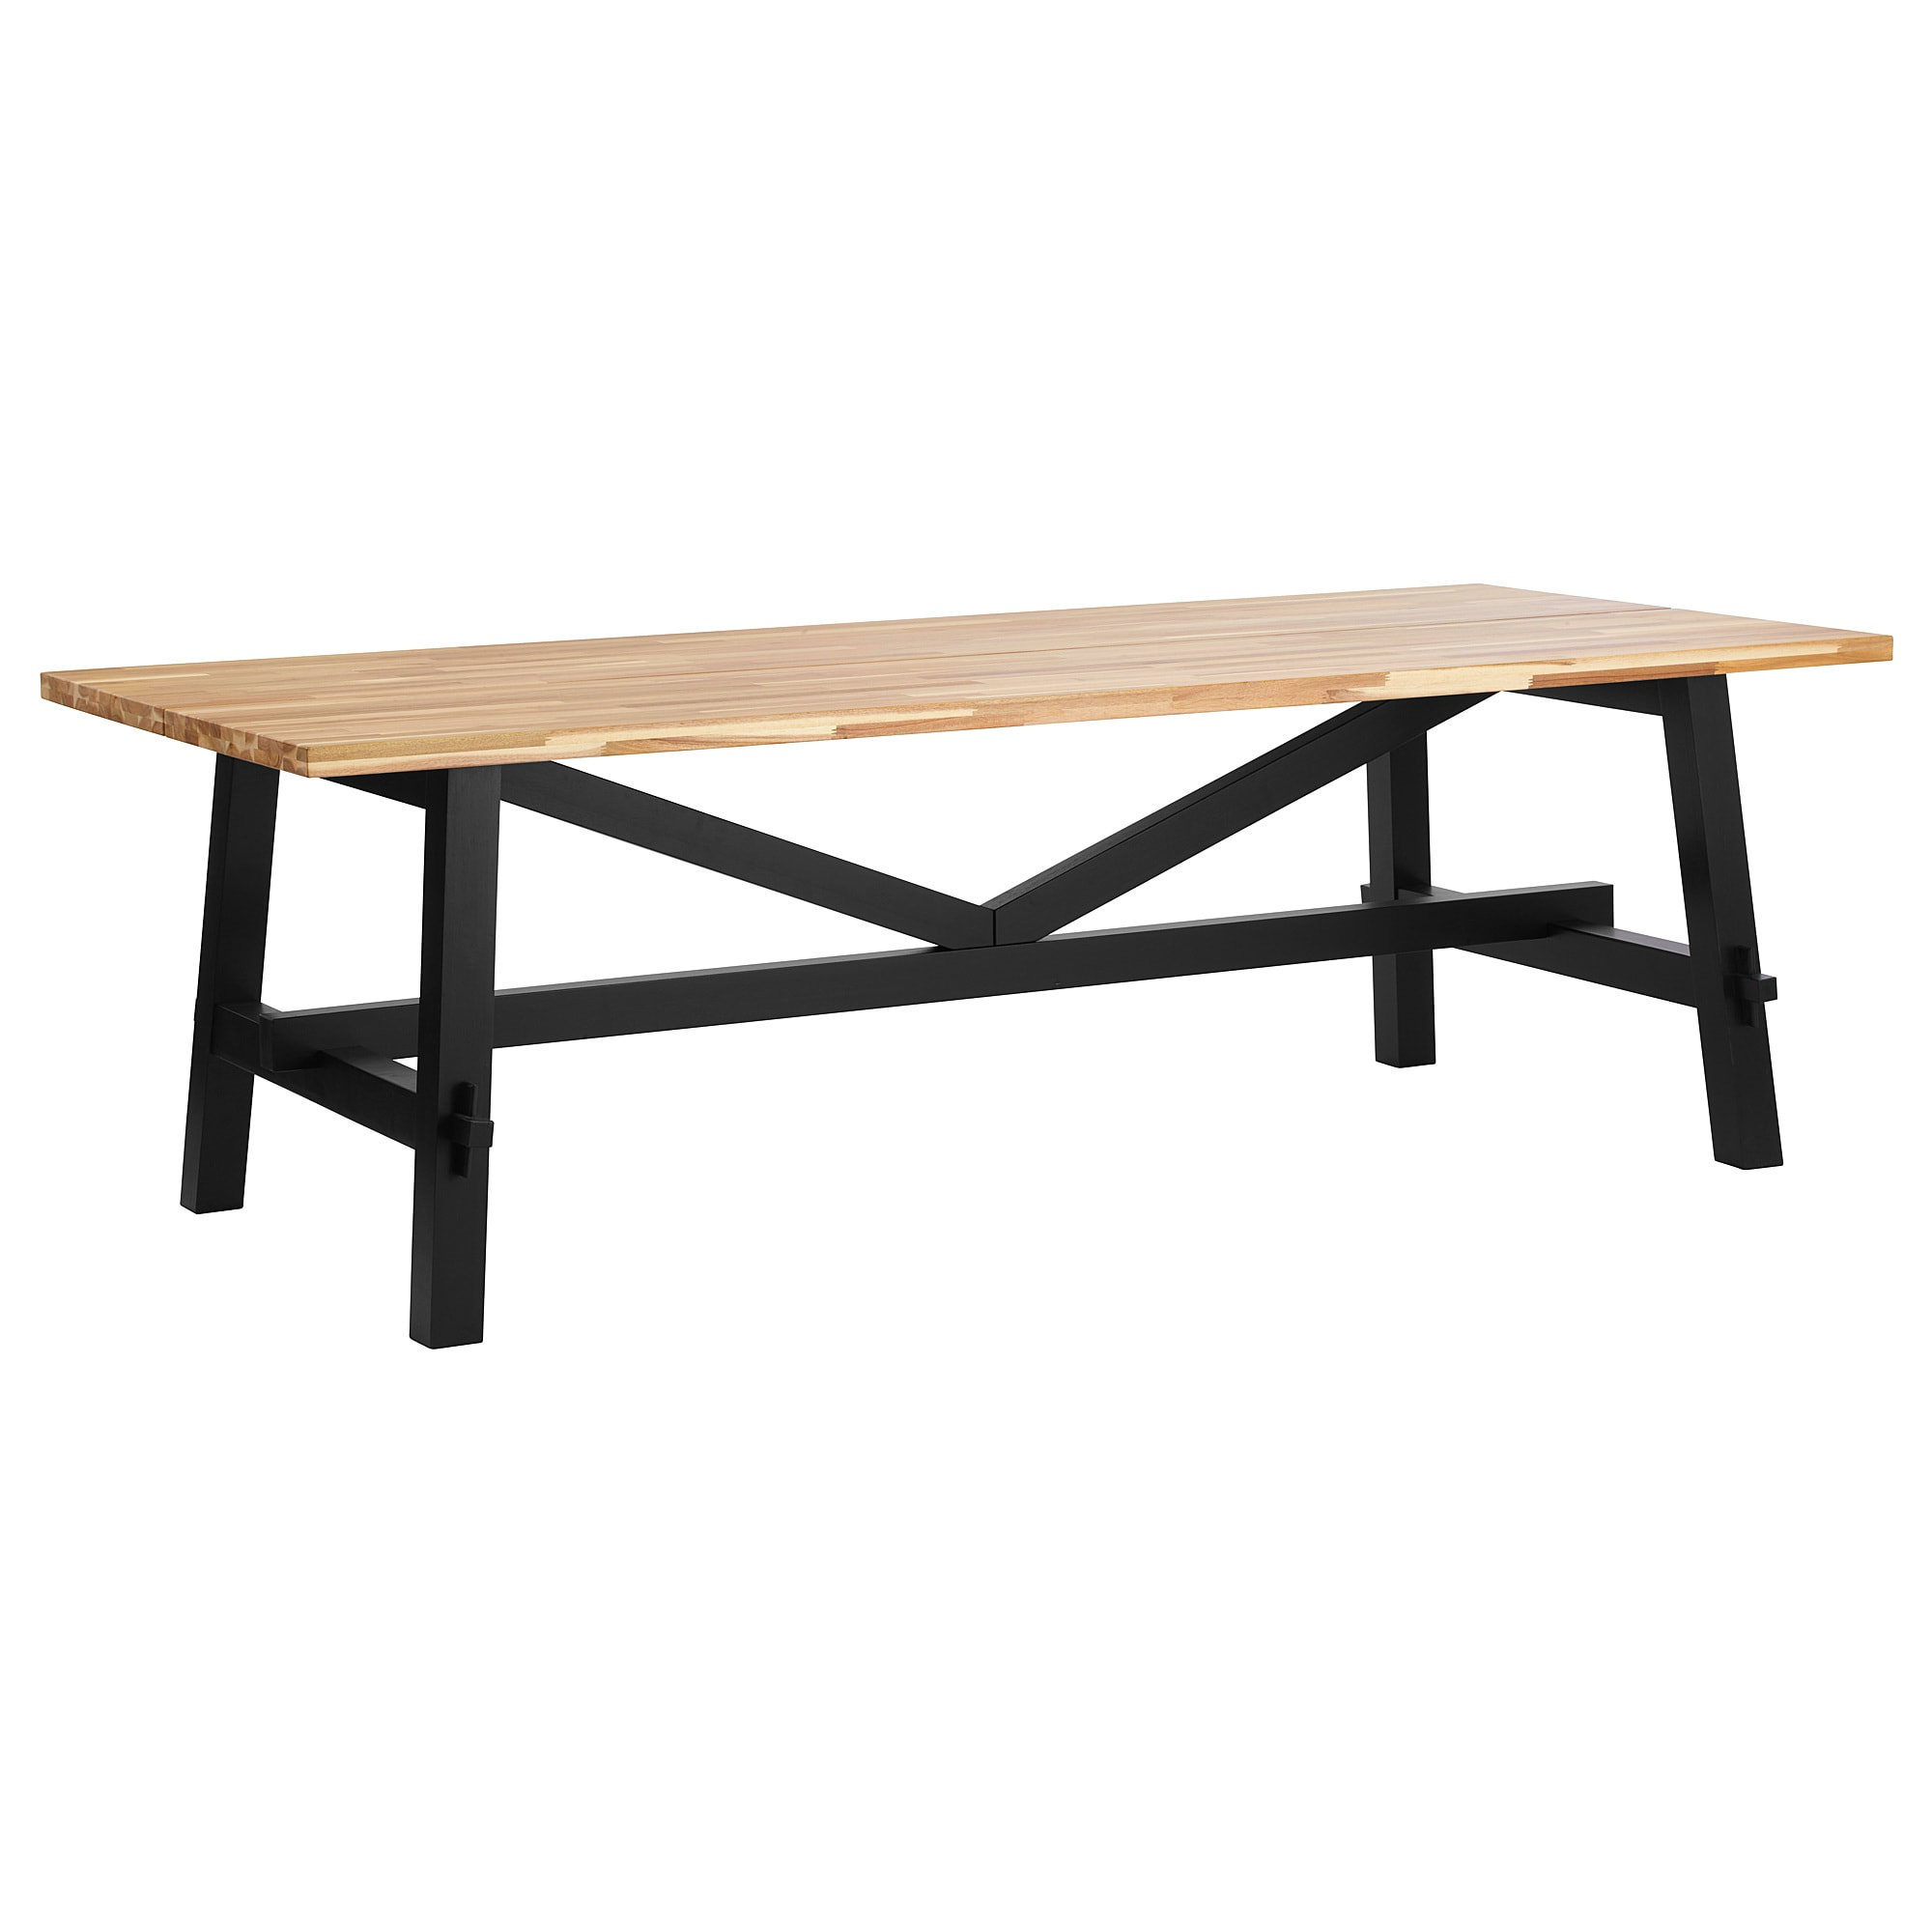 Ikea Mesas De Comedor Mndw Skogsta Mesa De Edor Acacia 235 X 100 Cm Ikea